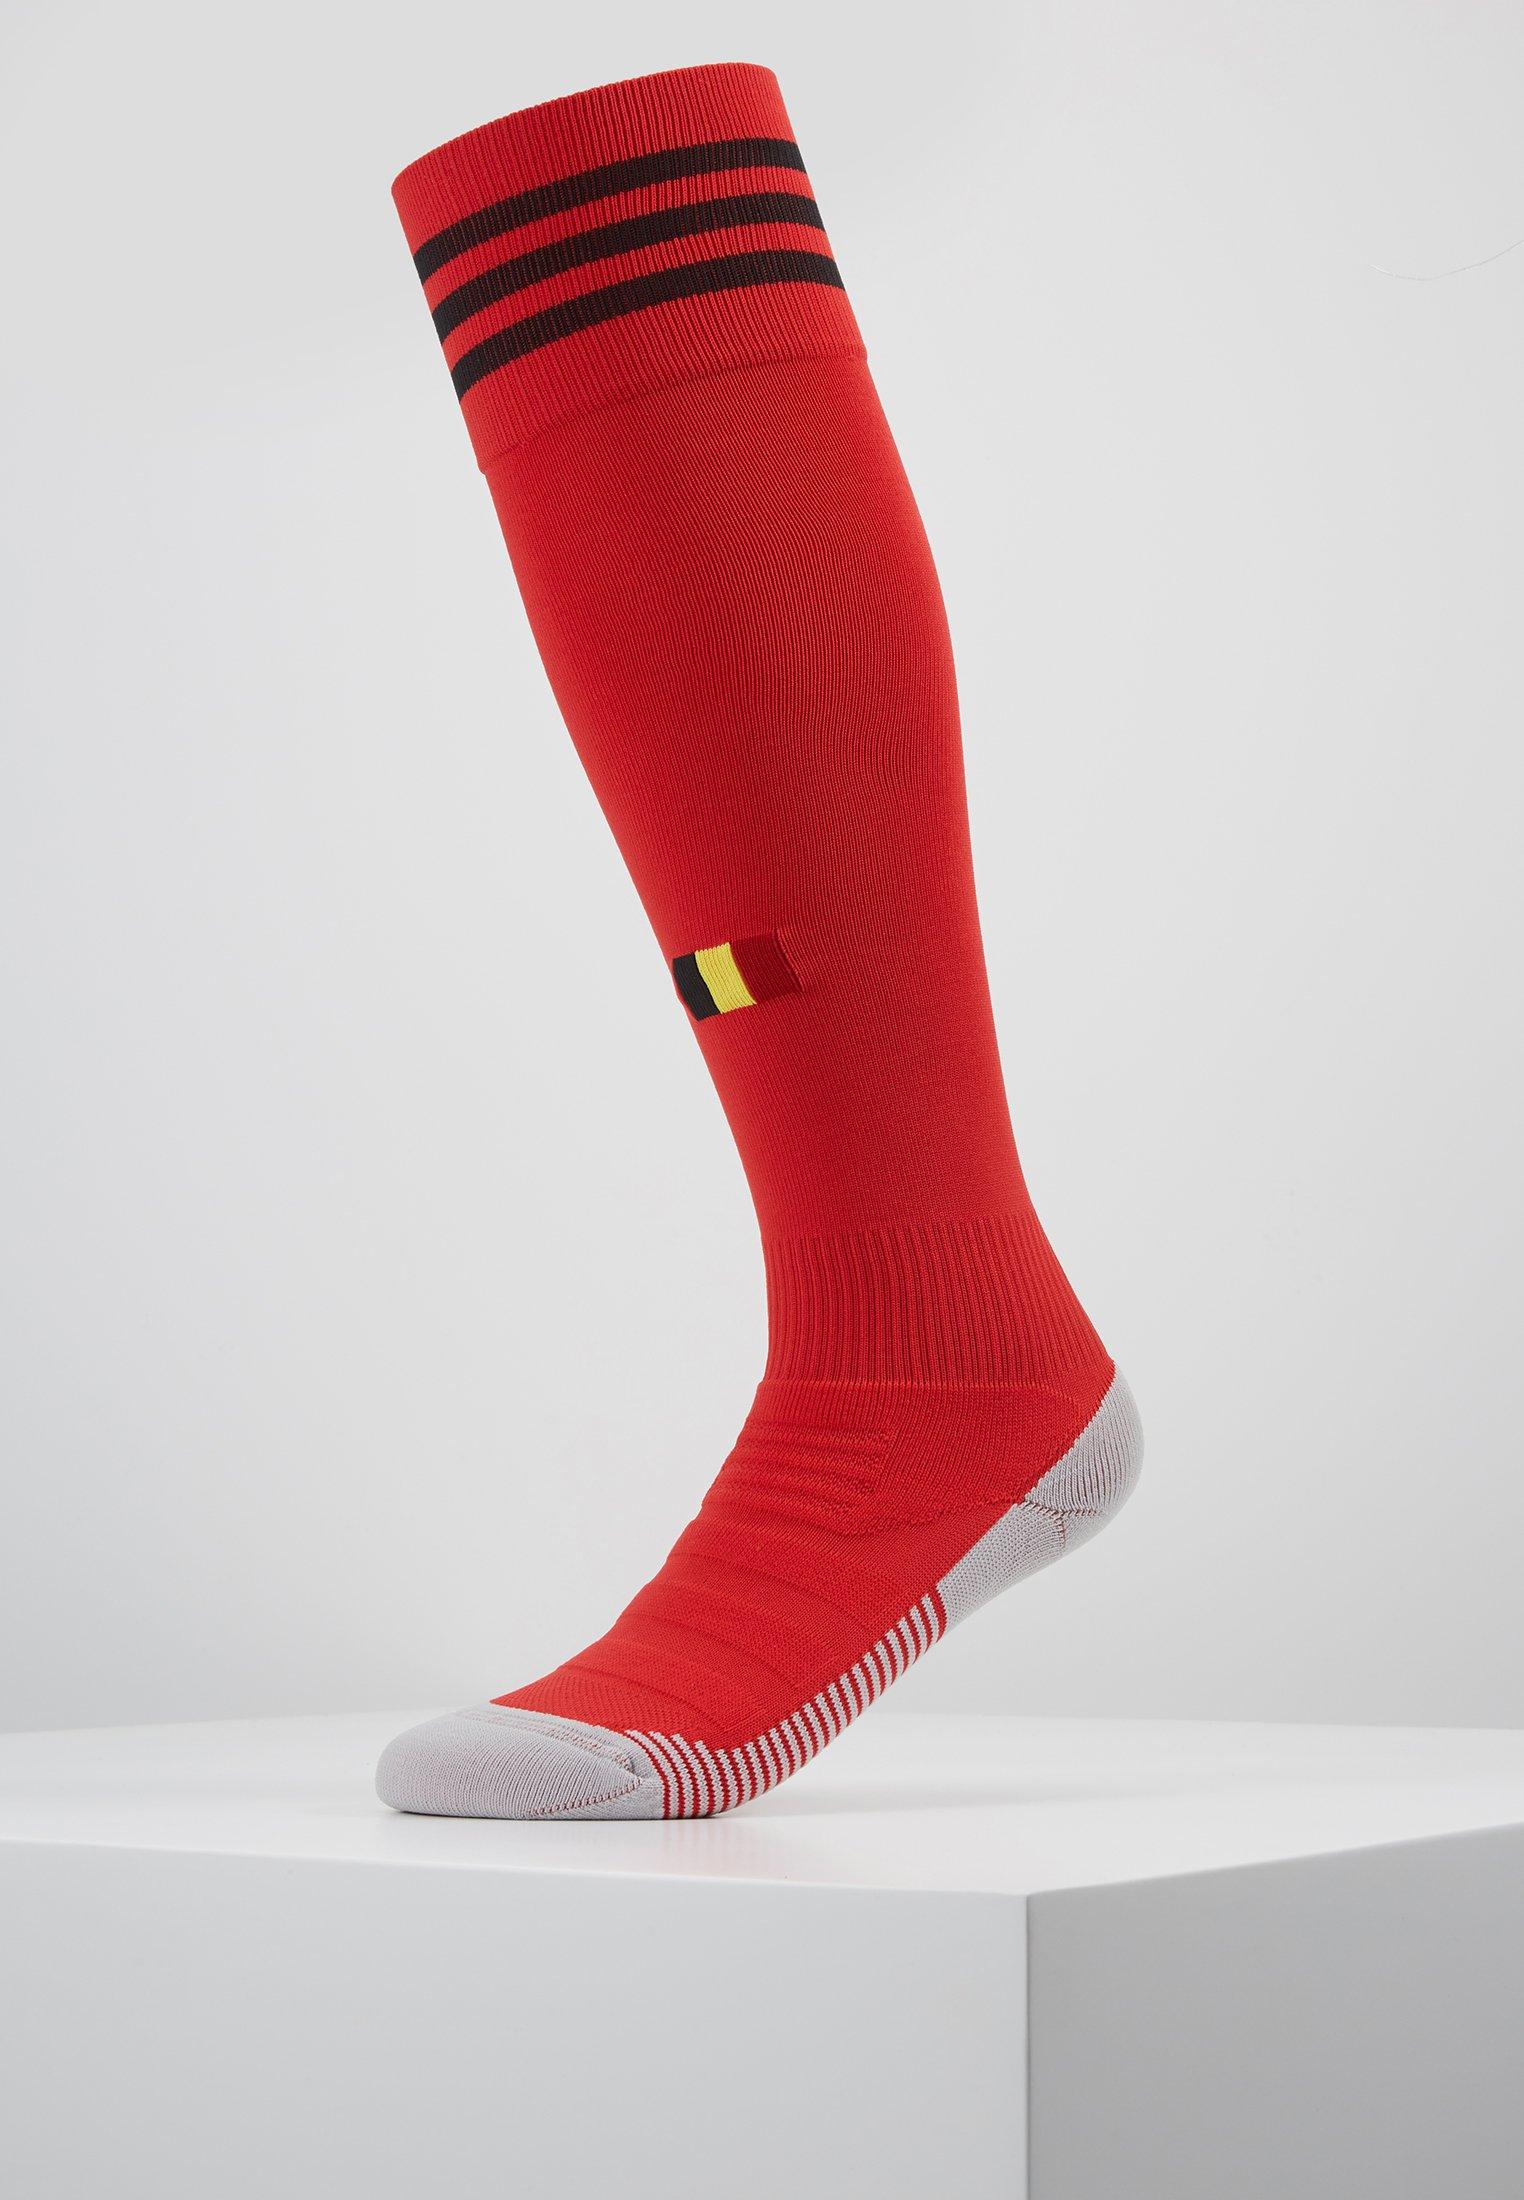 Femme BELGIUM RBFA HOME SOCKS - Chaussettes de sport